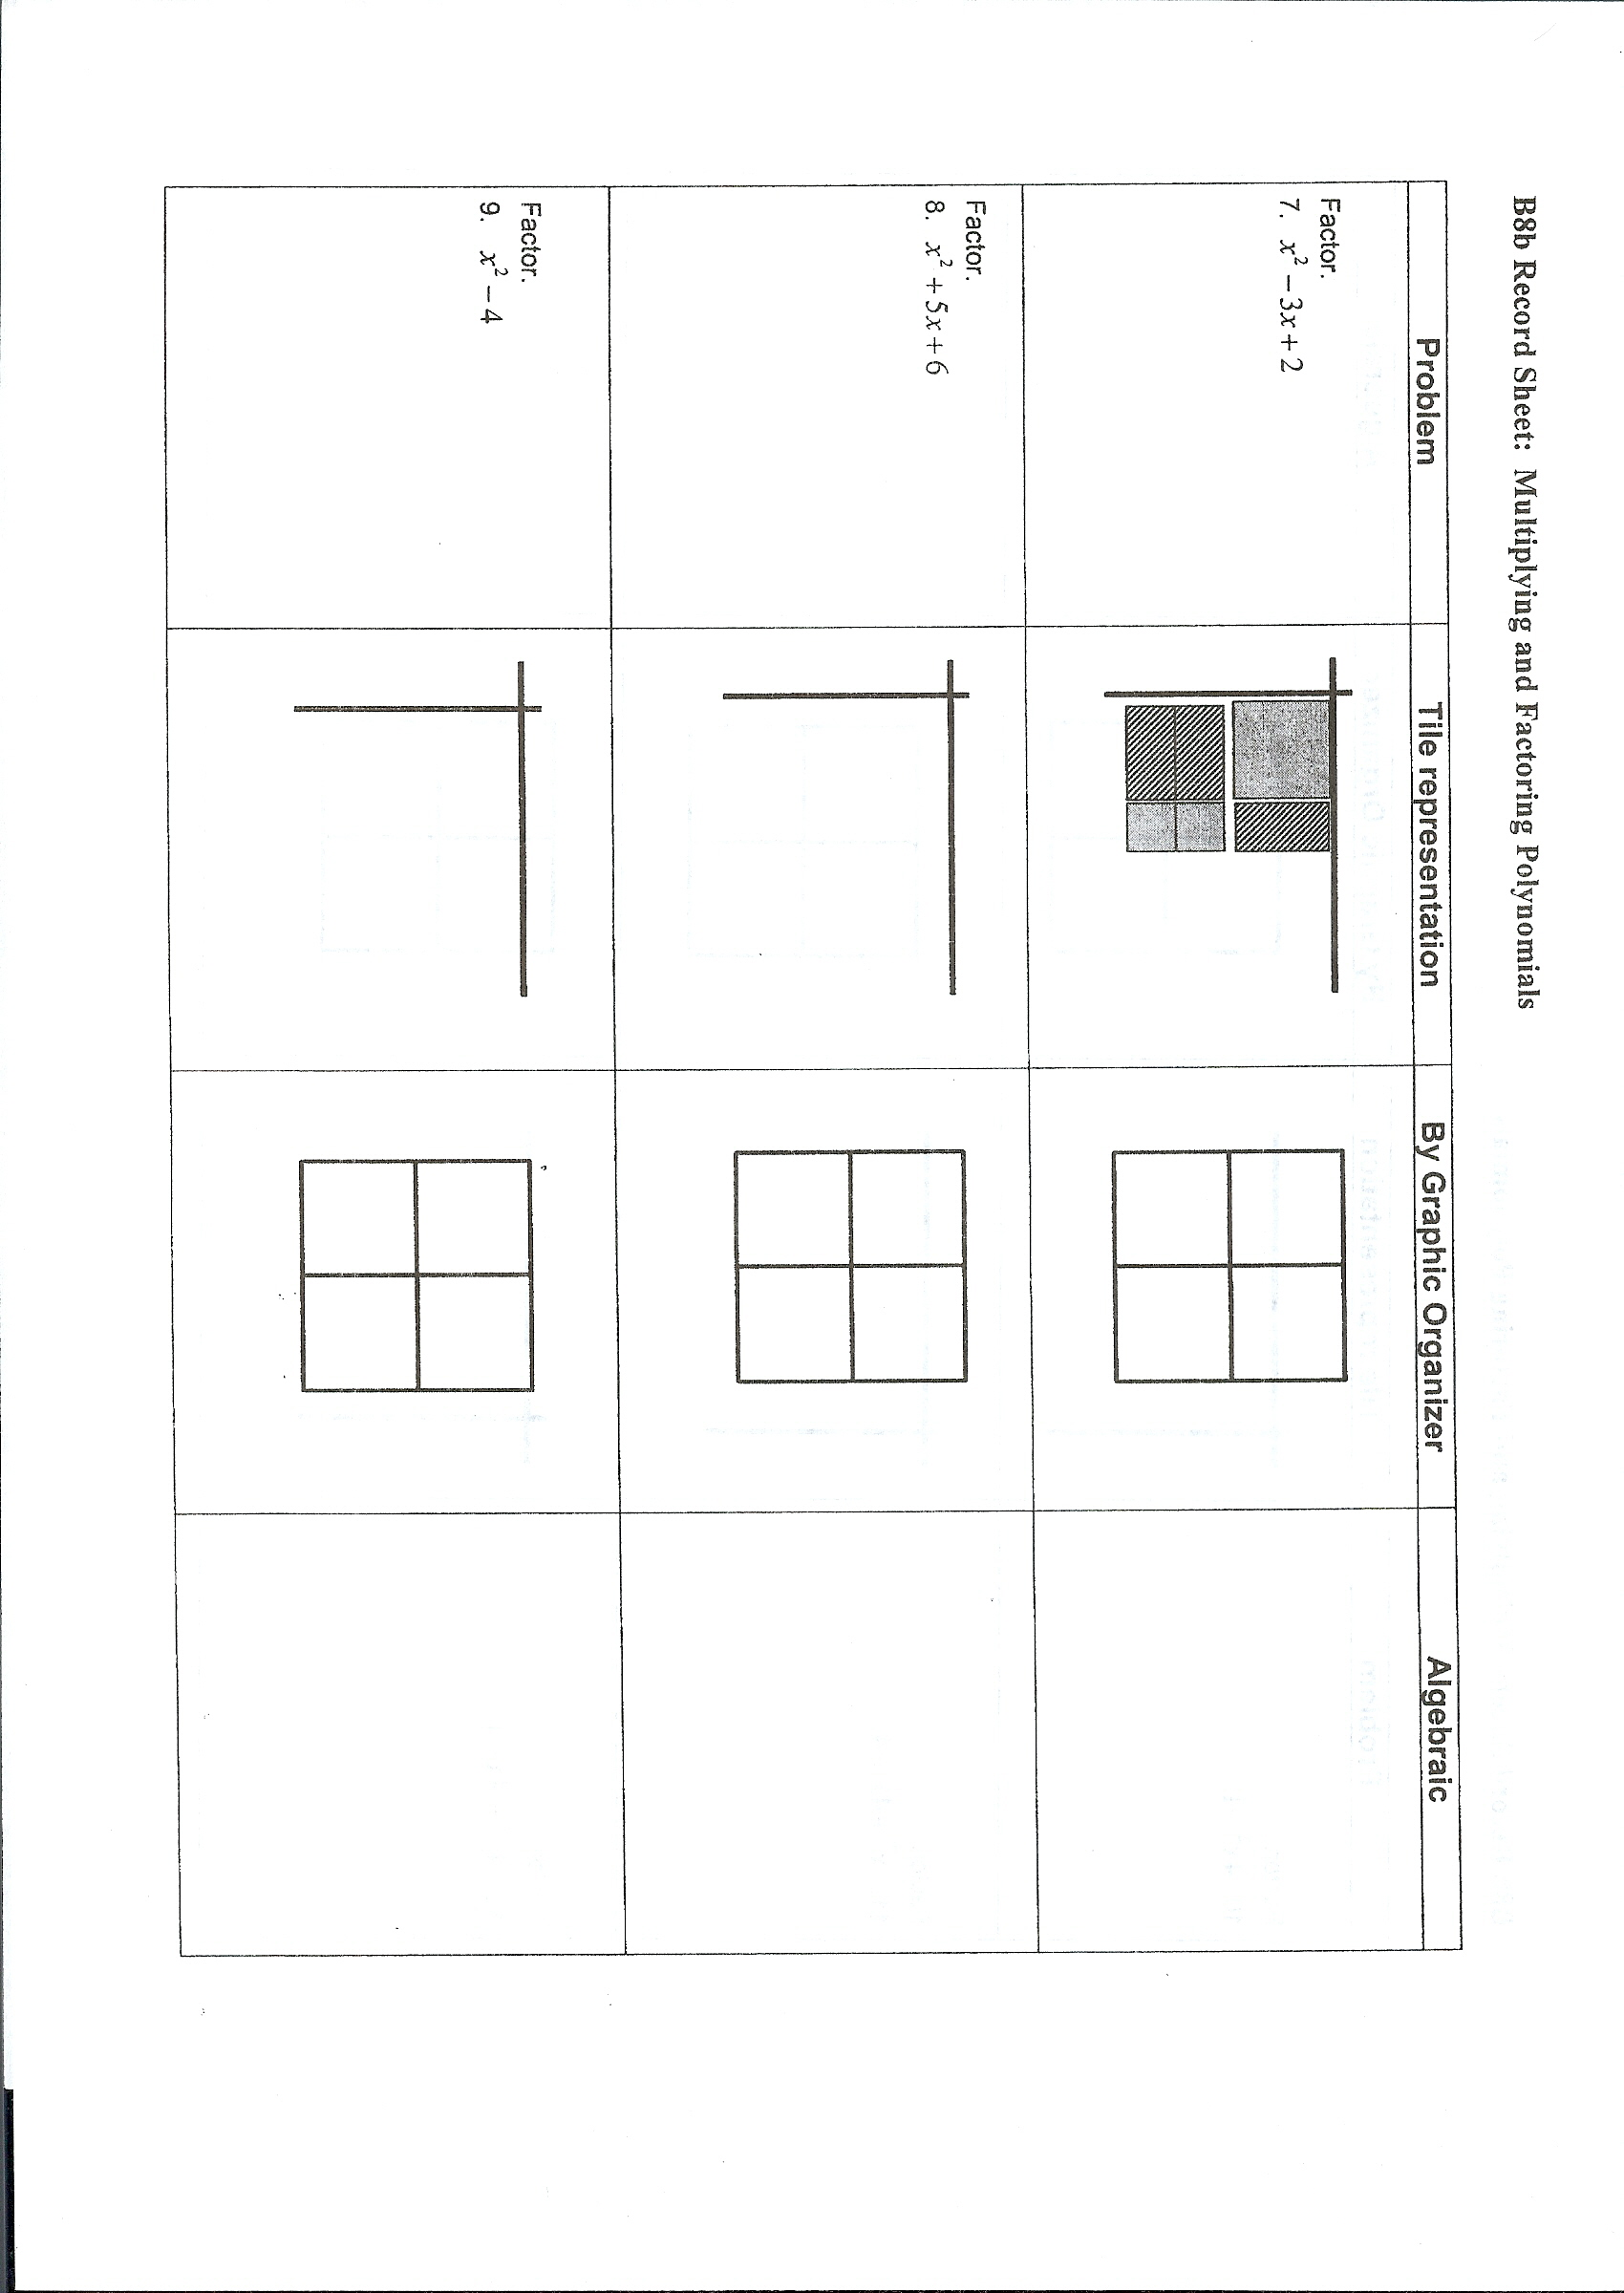 stanford 10 practice test pdf